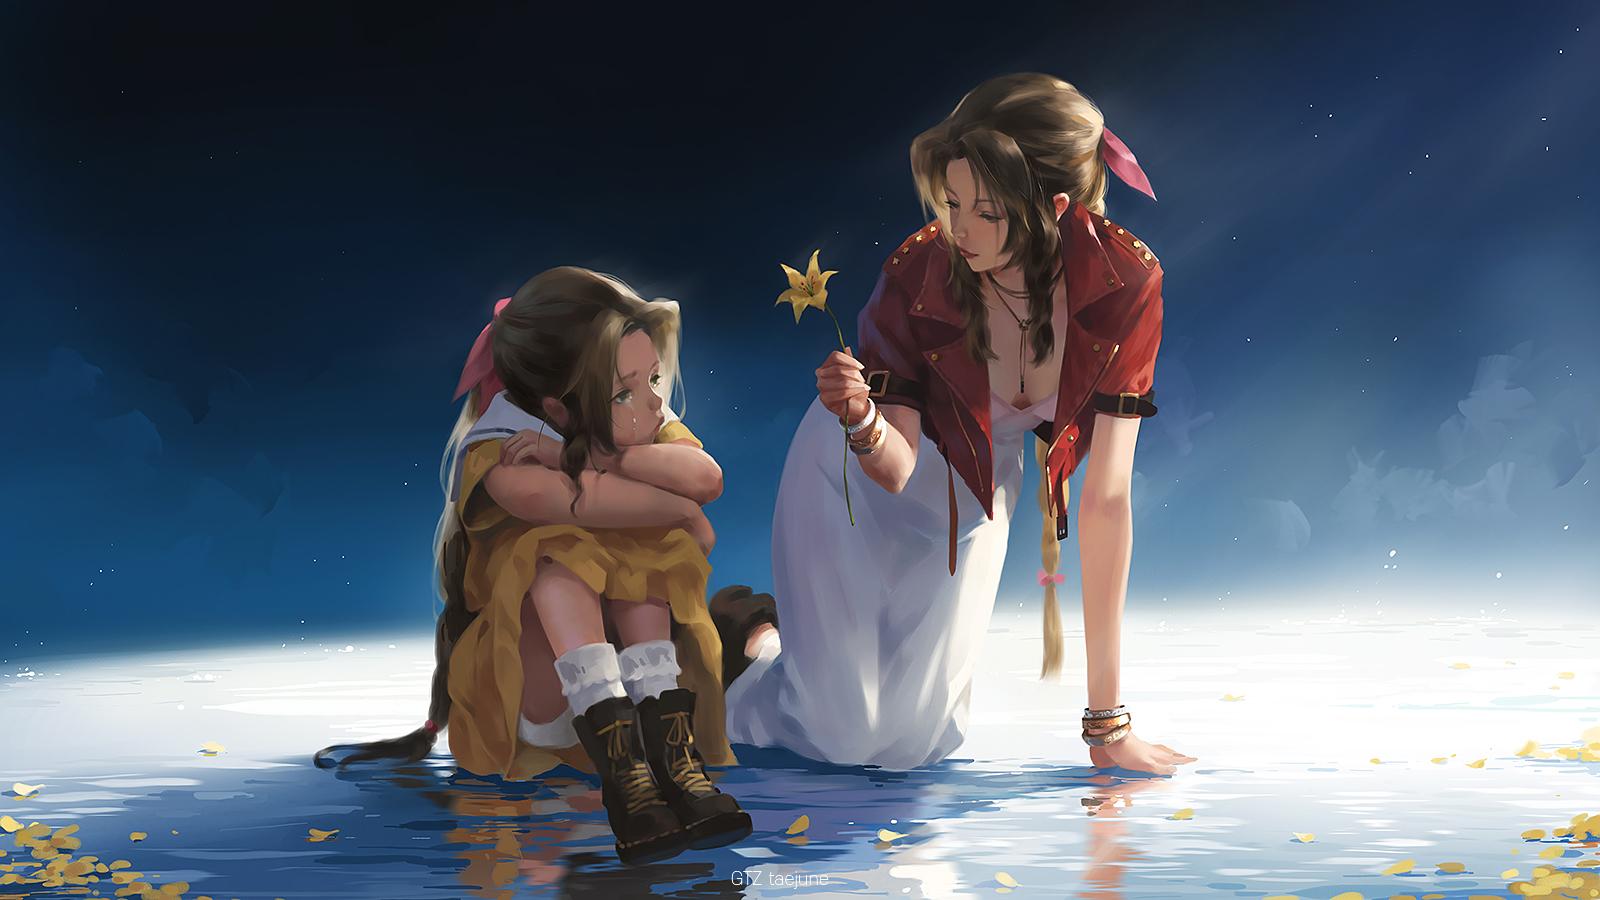 Anime 1600x900 Final Fantasy Final Fantasy VII Aerith Gainsborough dress flowers Taejune Kim anime